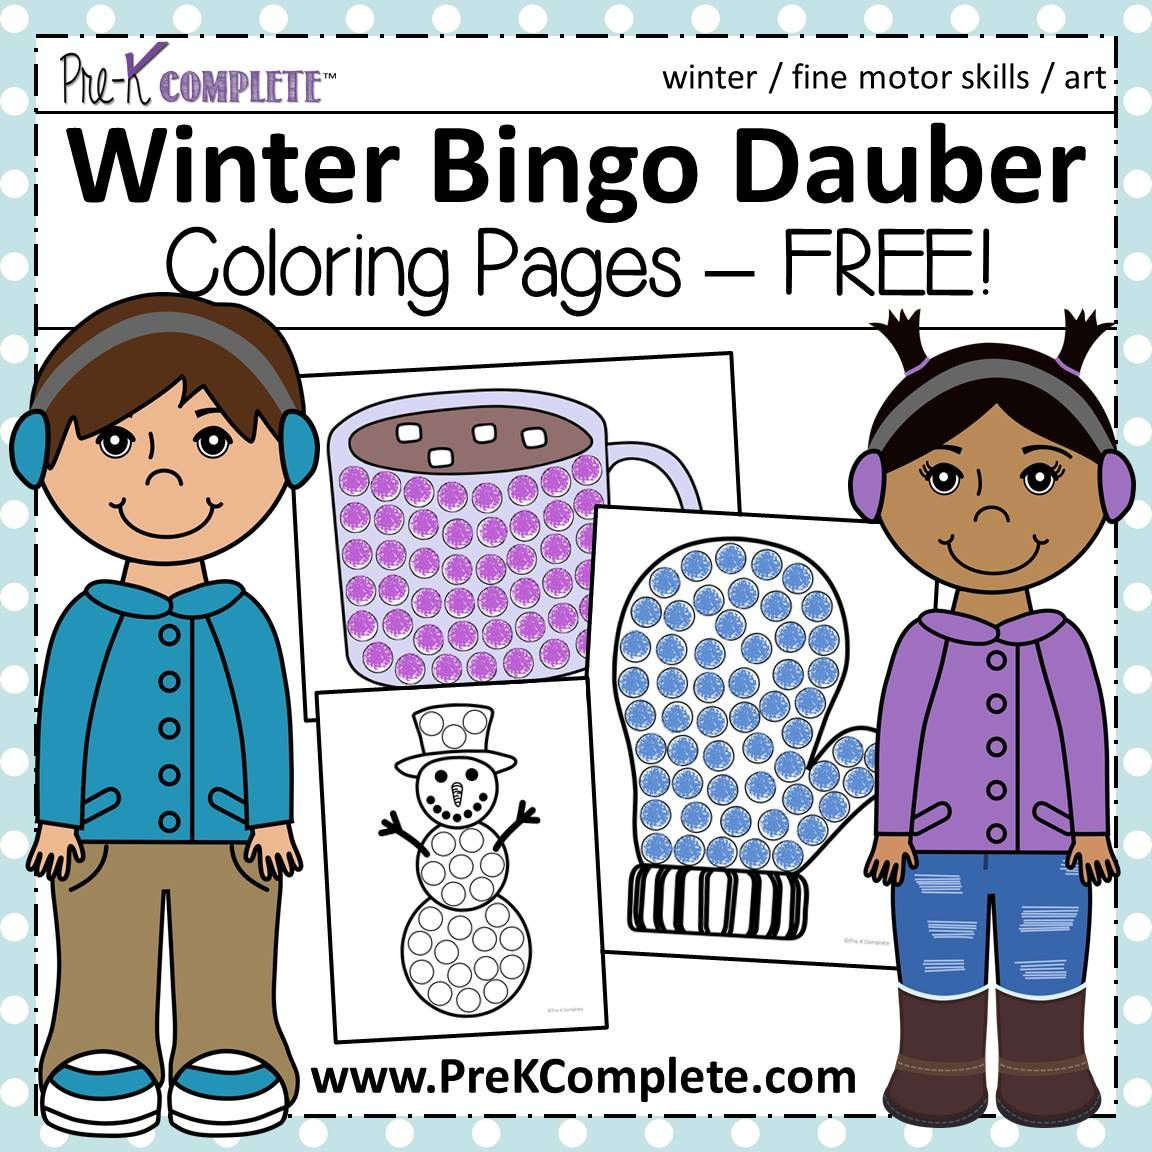 Winter Bingo Dauber Coloring Pages